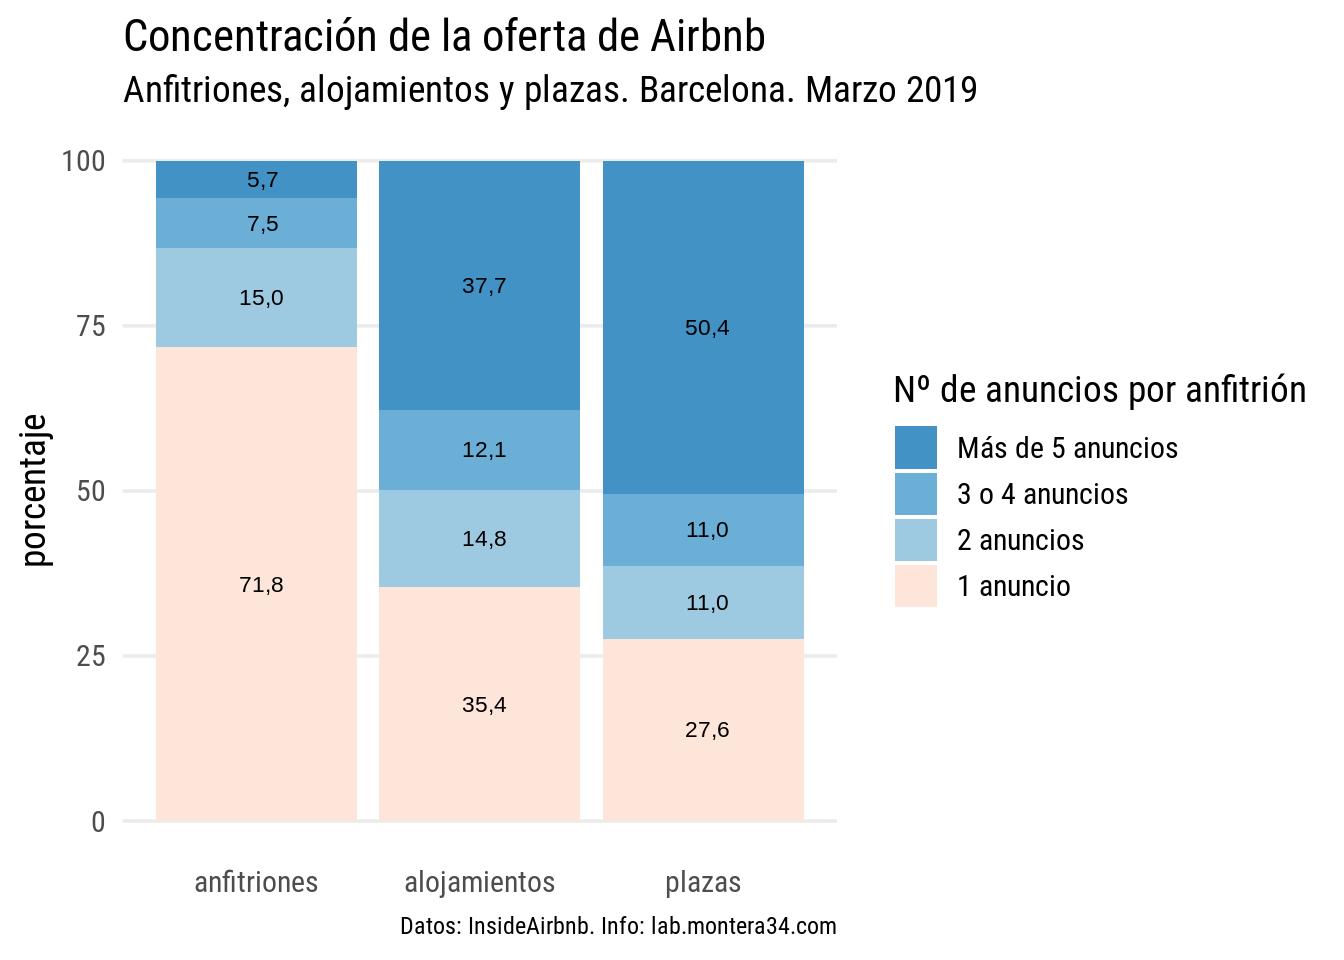 static/images/barcelona/hosts/concentracion-oferta-porcentaje-airbnb-barcelona-201903.png